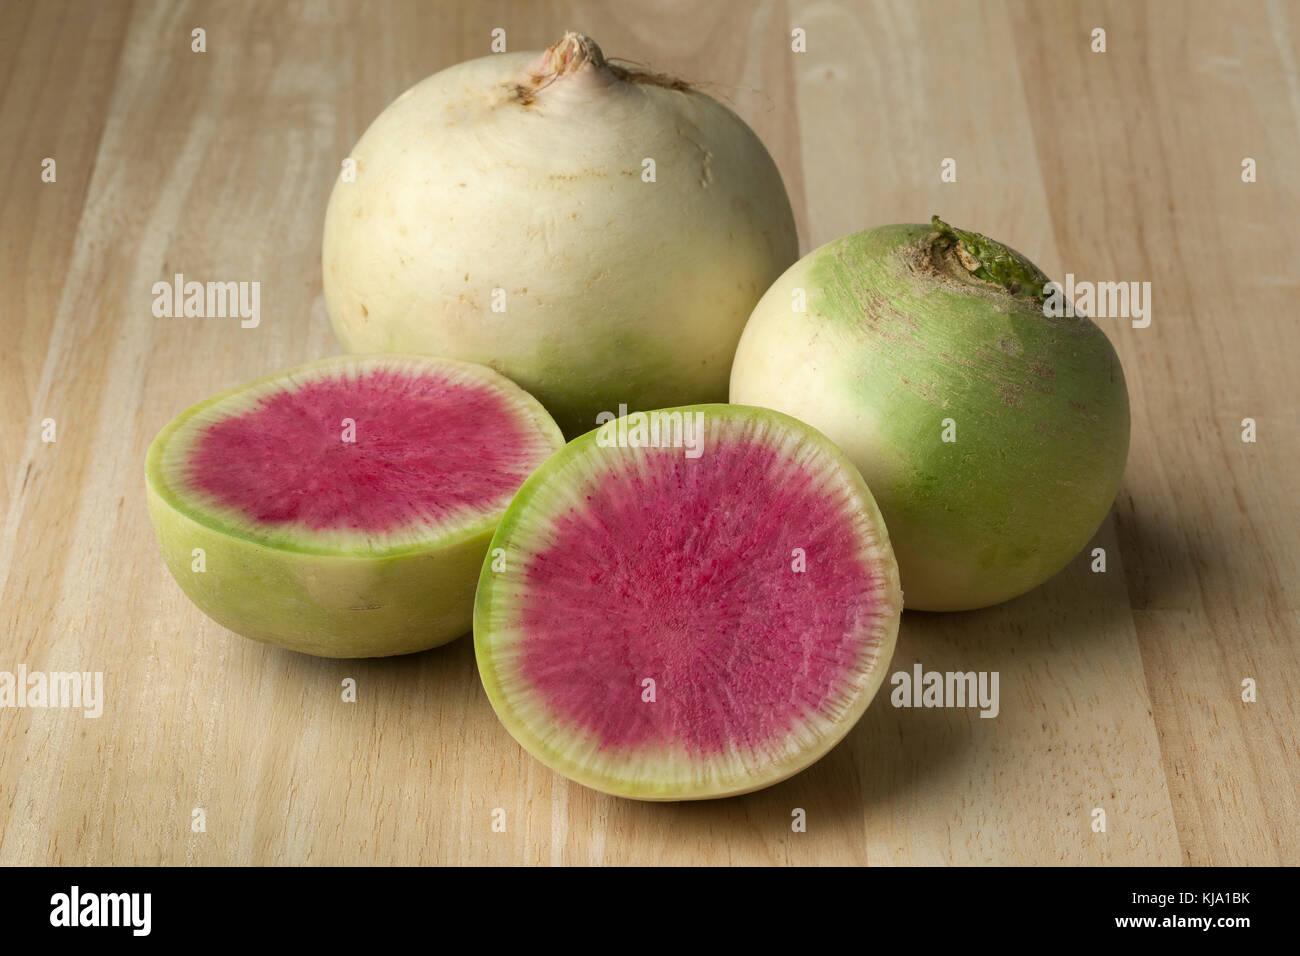 Whole and partial fresh raw watermelon radish - Stock Image